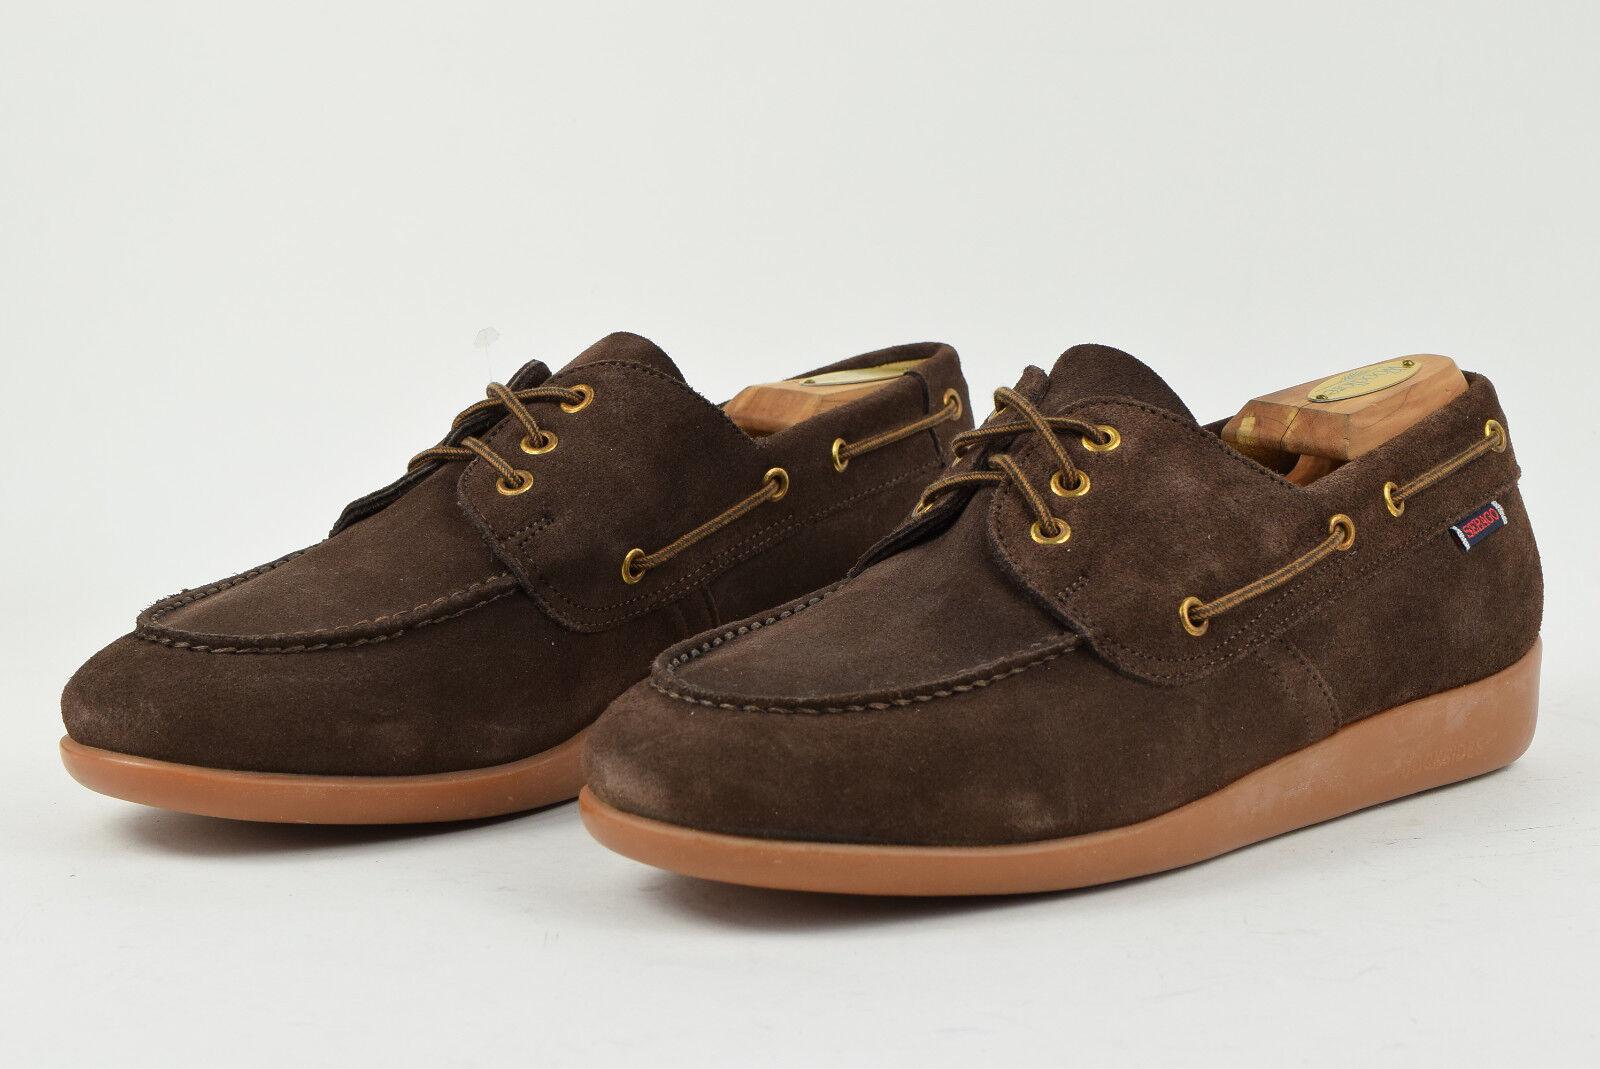 Sebago Jobson Docksides Boat Dark Brown shoes UK 9.5 W